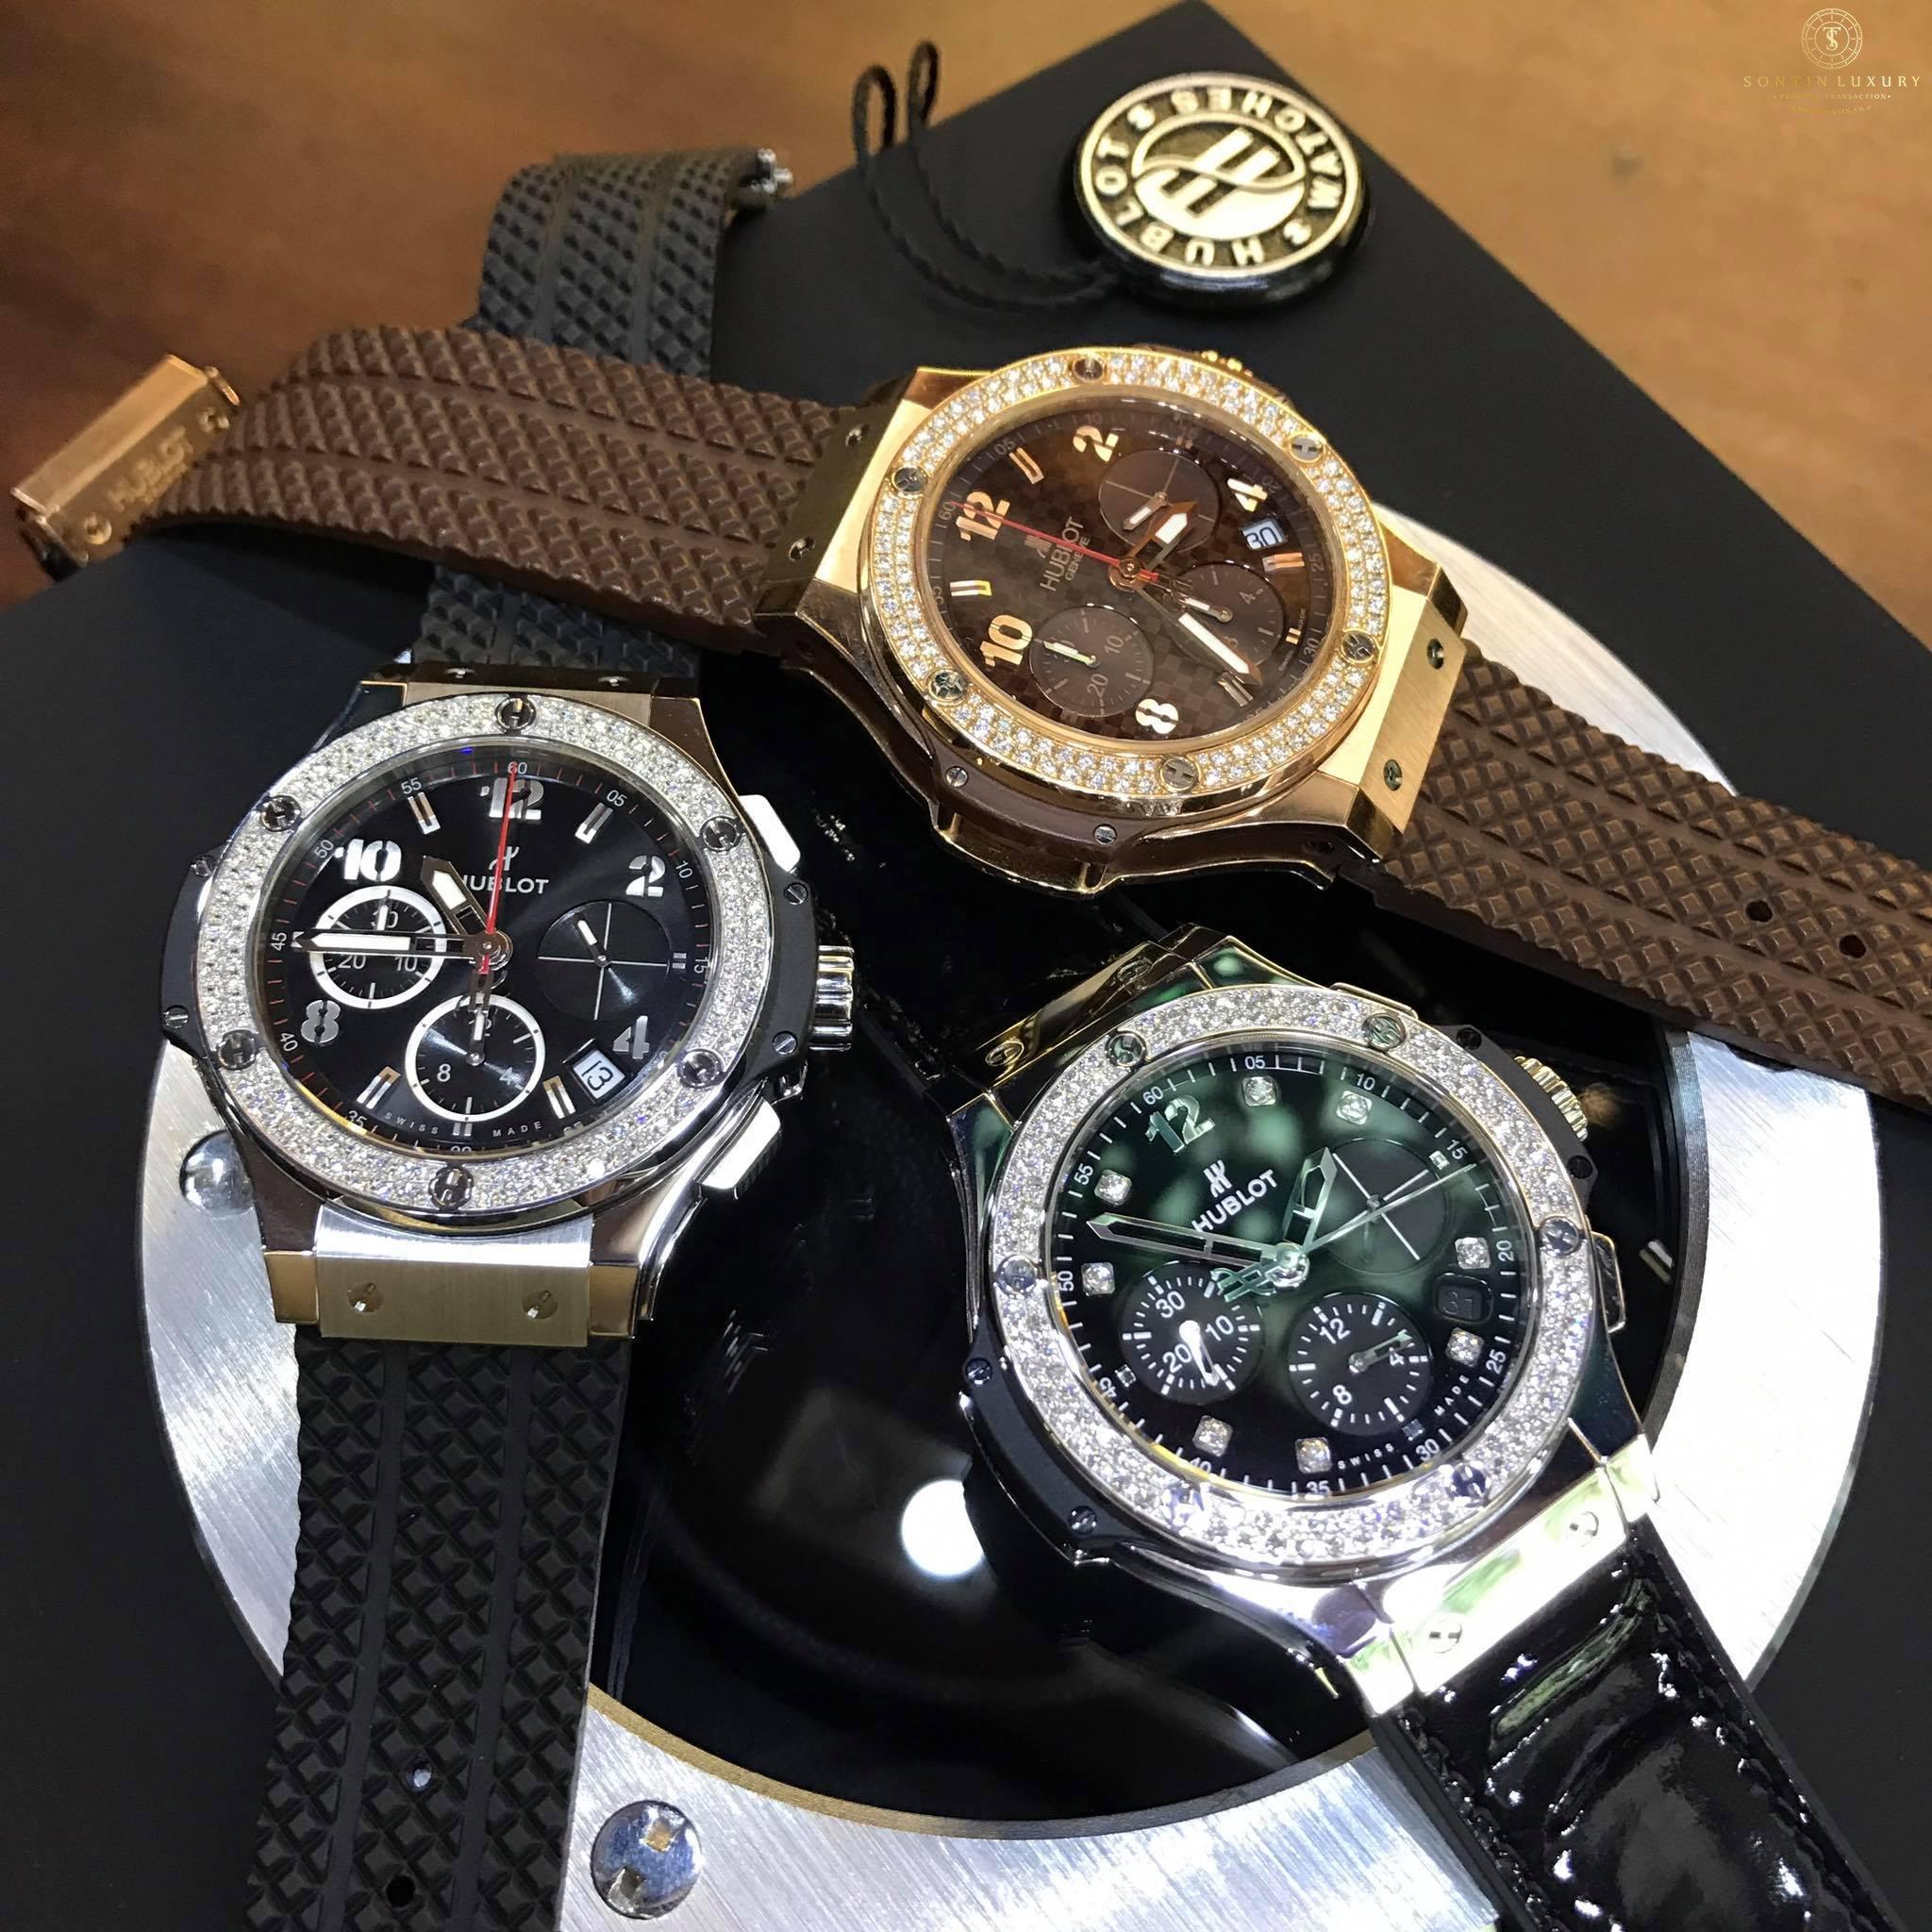 Hublot Big Bang Shiny Steel Watch 41mm 341.SX.1270.VR.1104